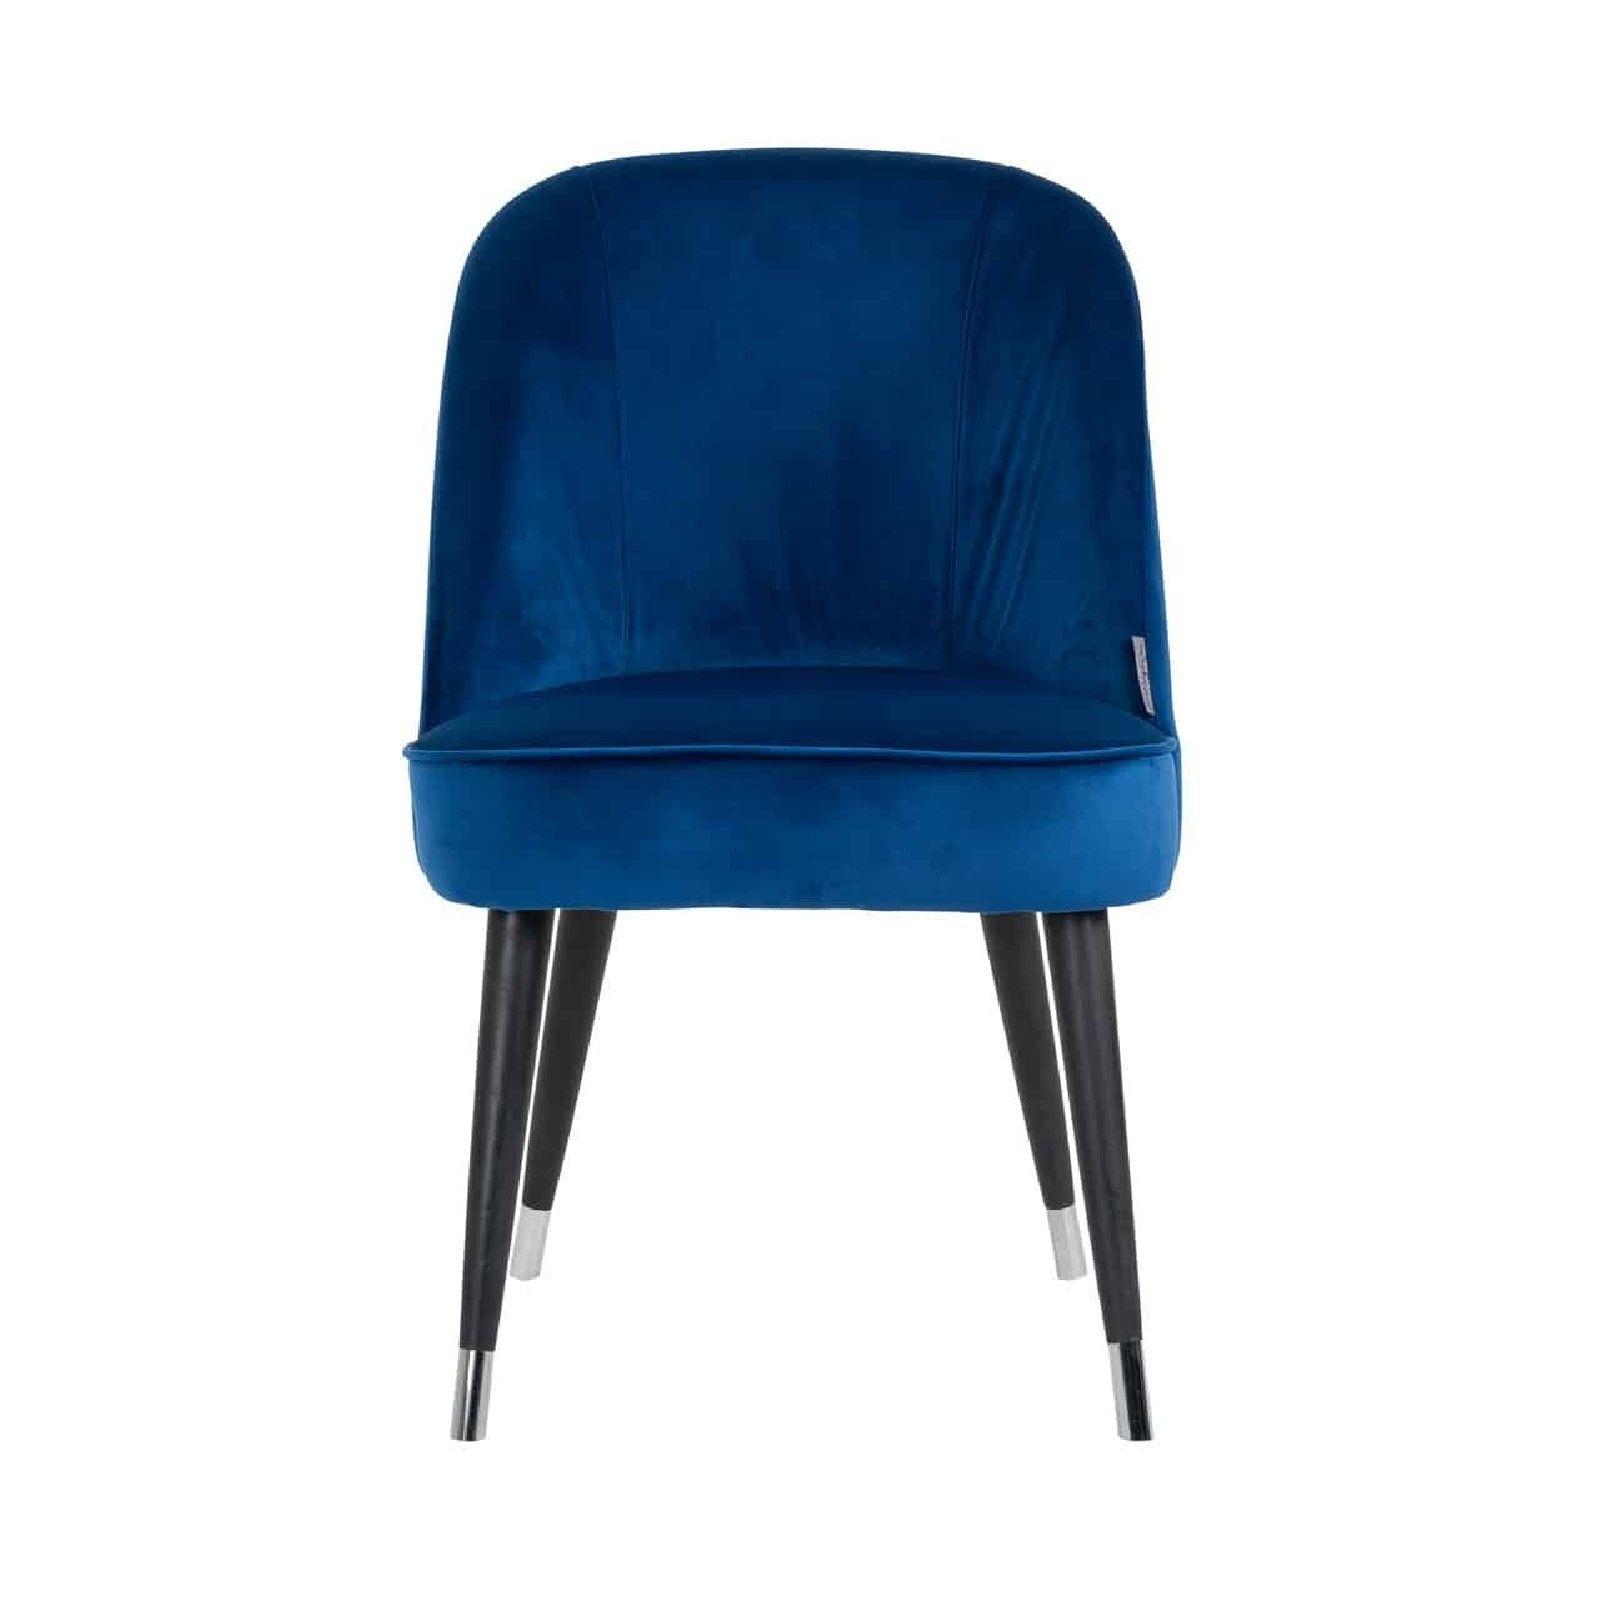 Chaise JuliusSilver or gold legs Salle à manger - 68